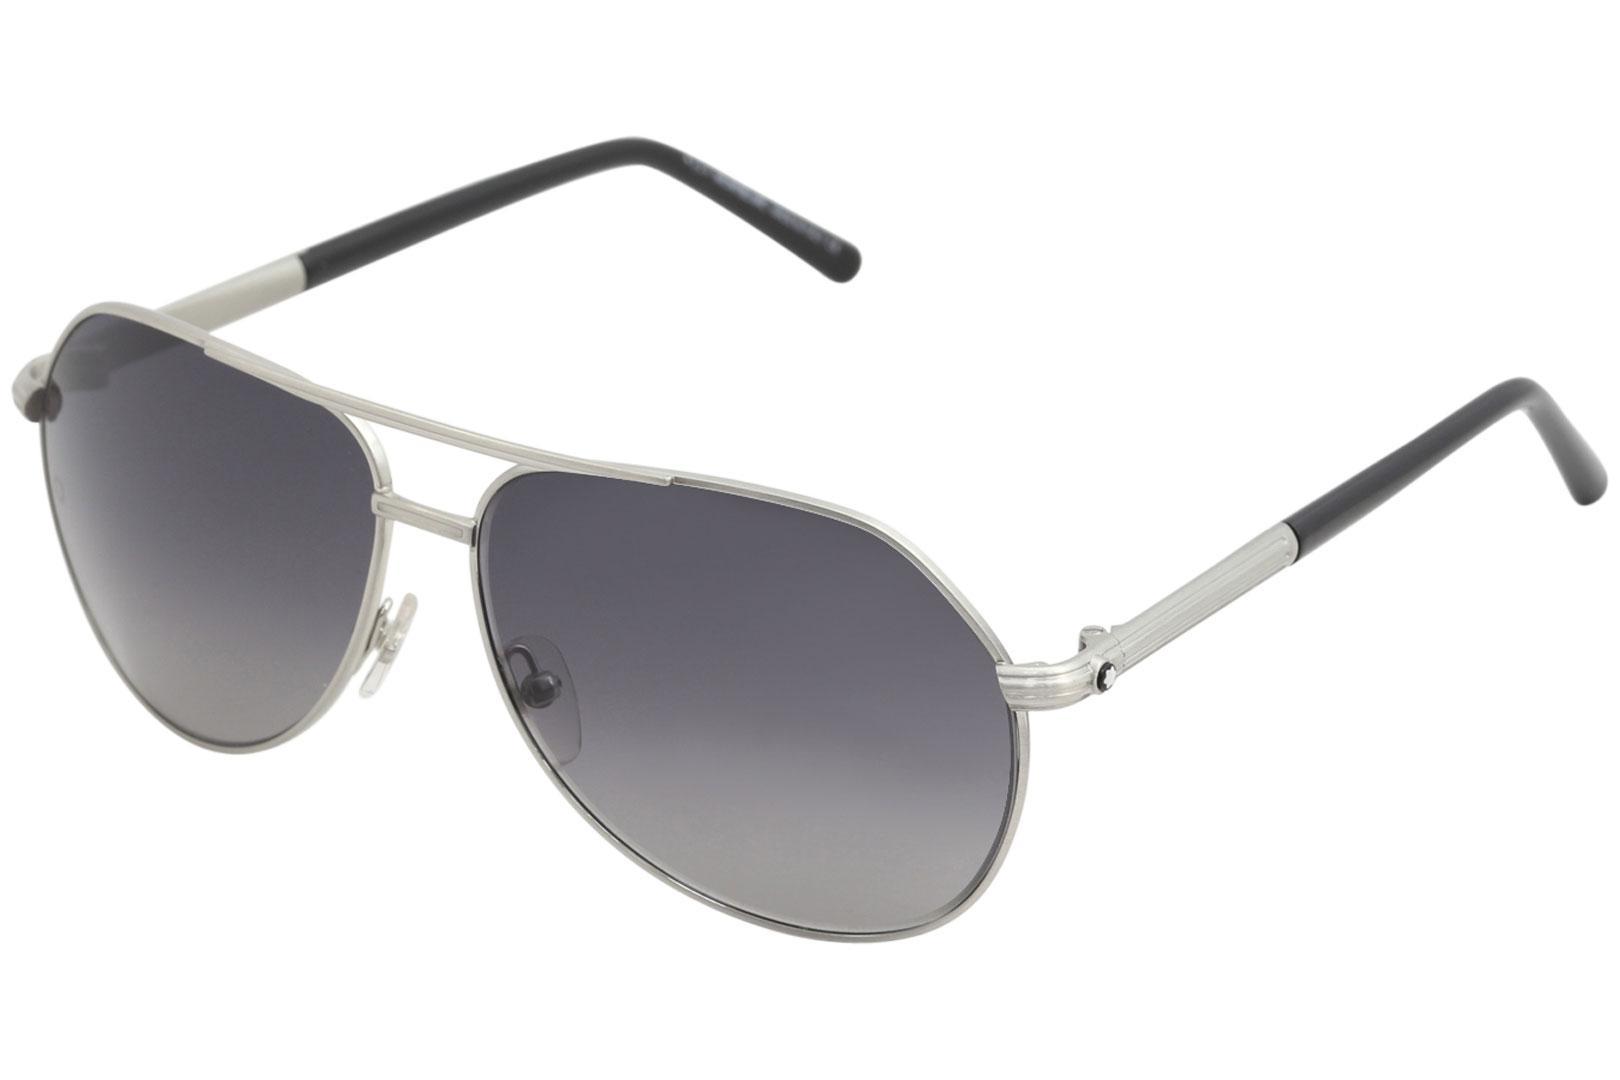 54db4a6196 Mont Blanc Men s MB504S MB 504 S Fashion Pilot Sunglasses by Mont Blanc